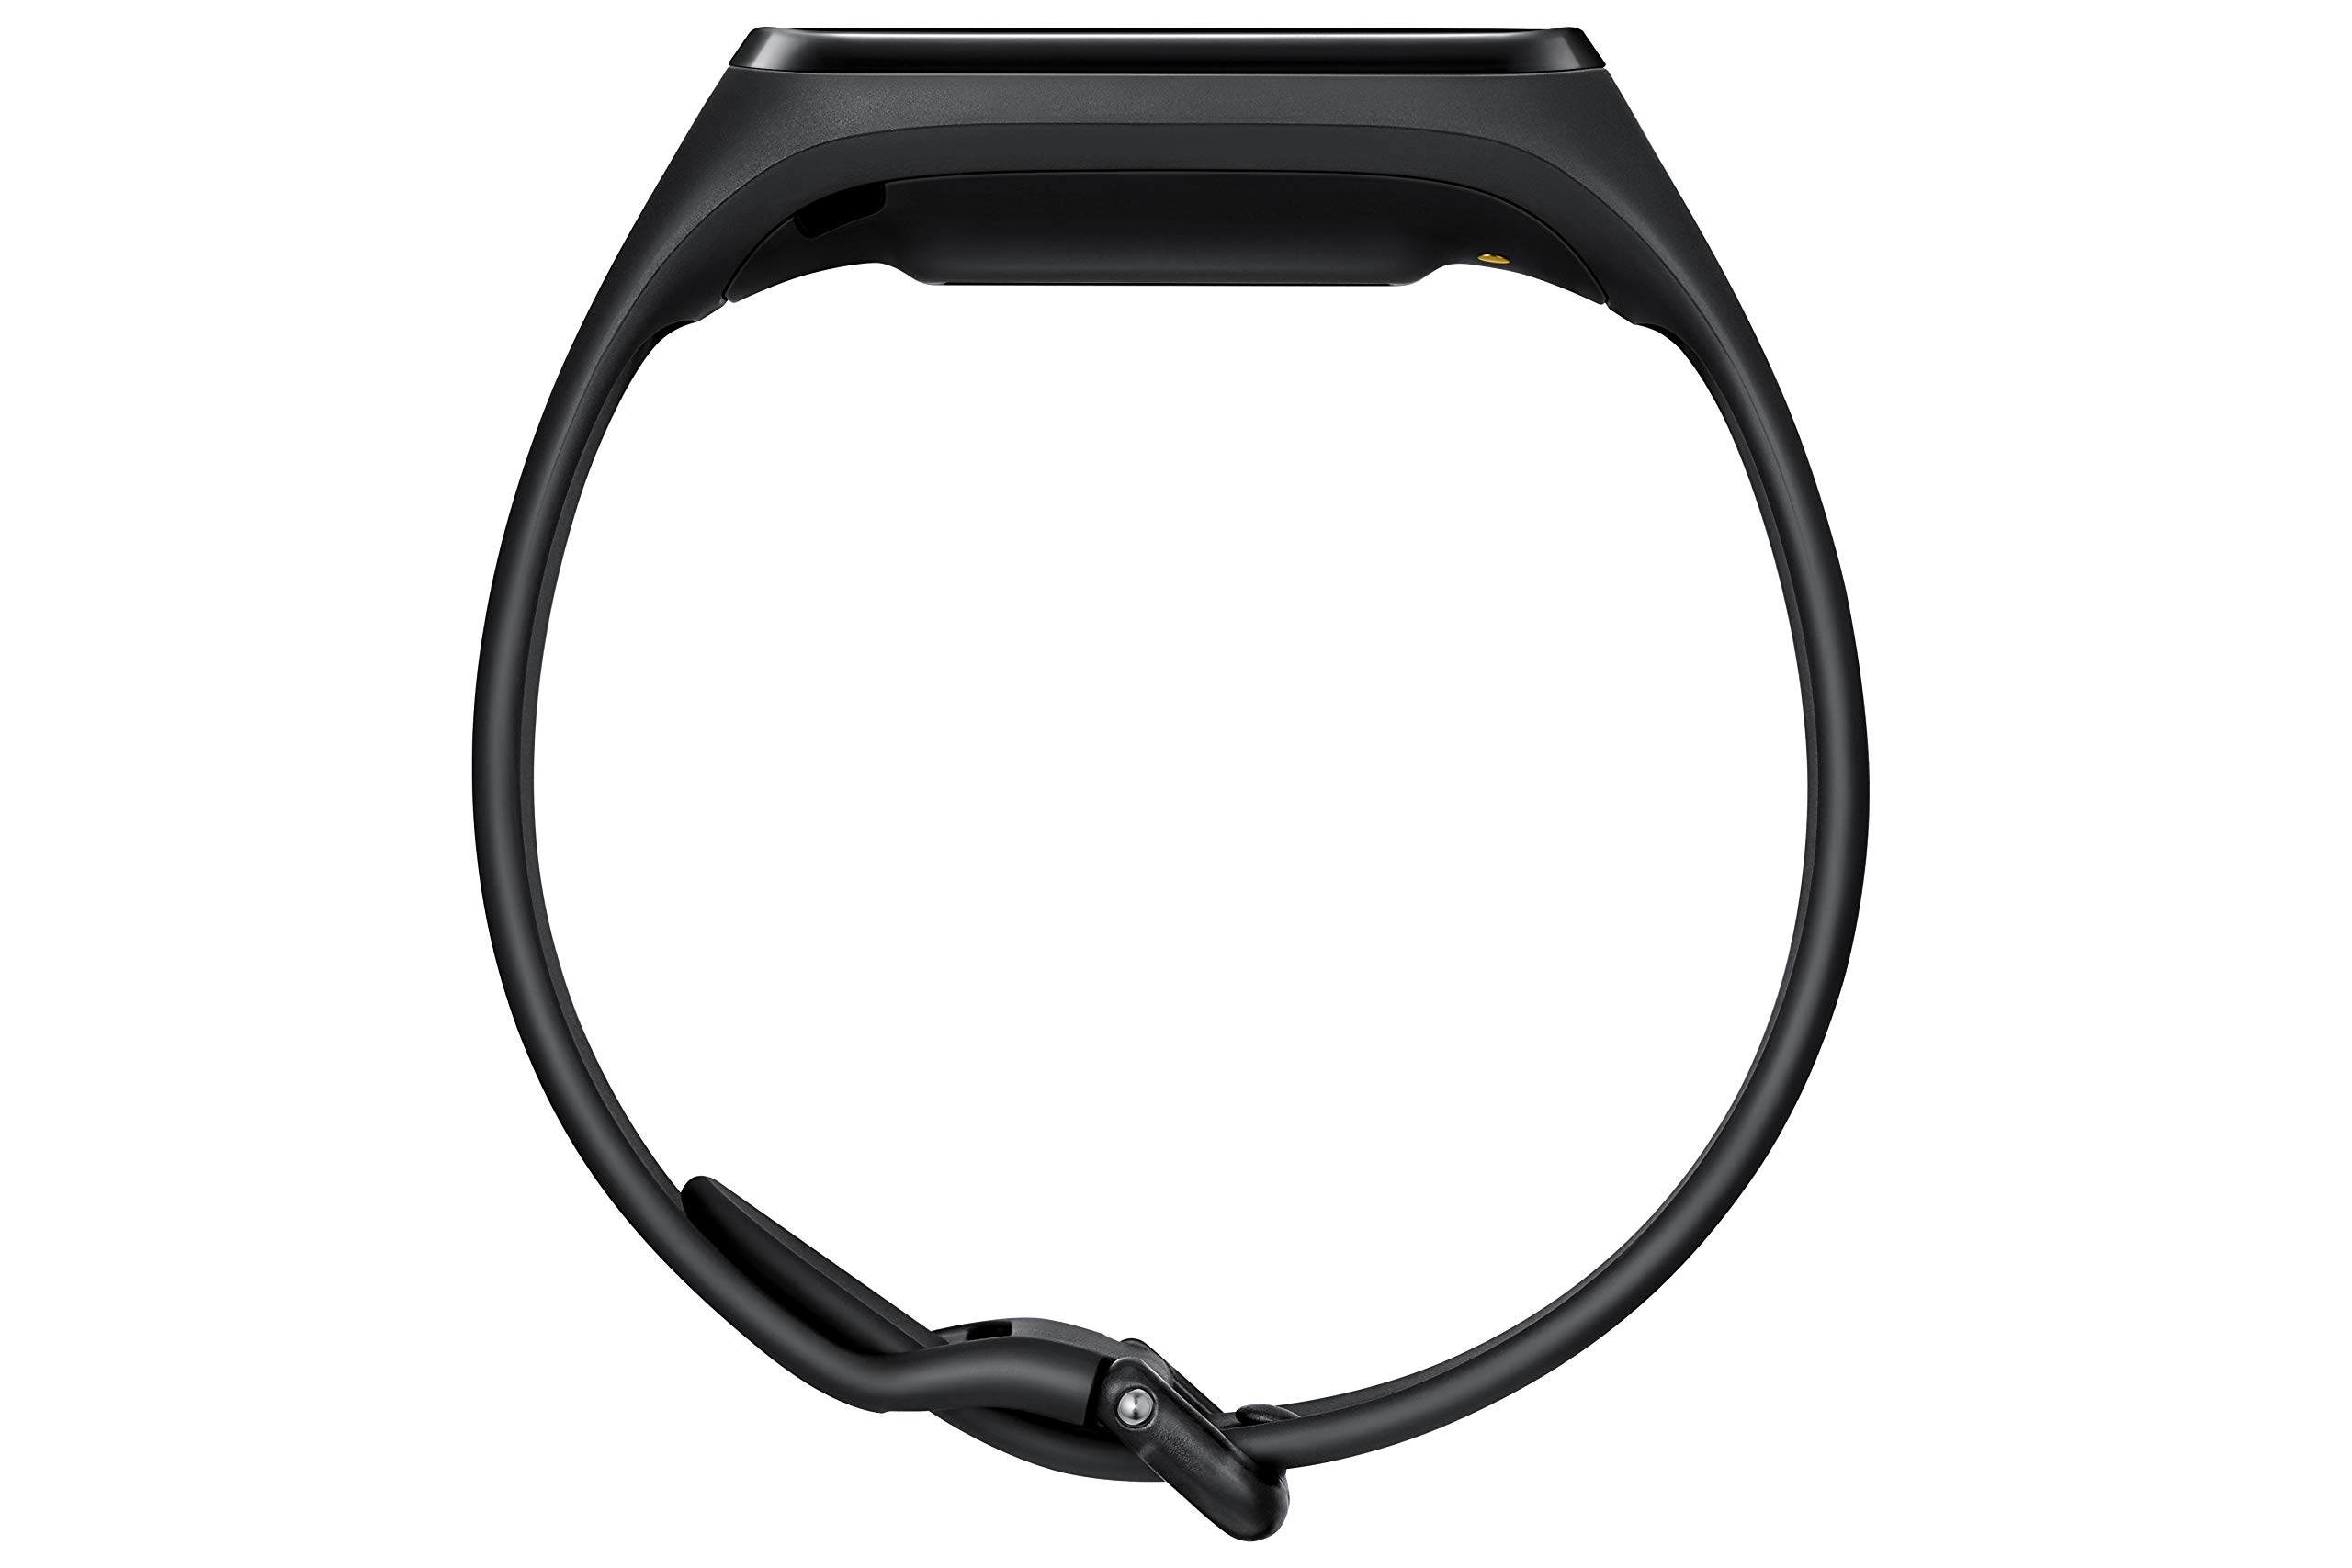 Samsung SM-R375NZKADBT Reloj Inteligente Negro 1,88 cm (0.74″) Móvil